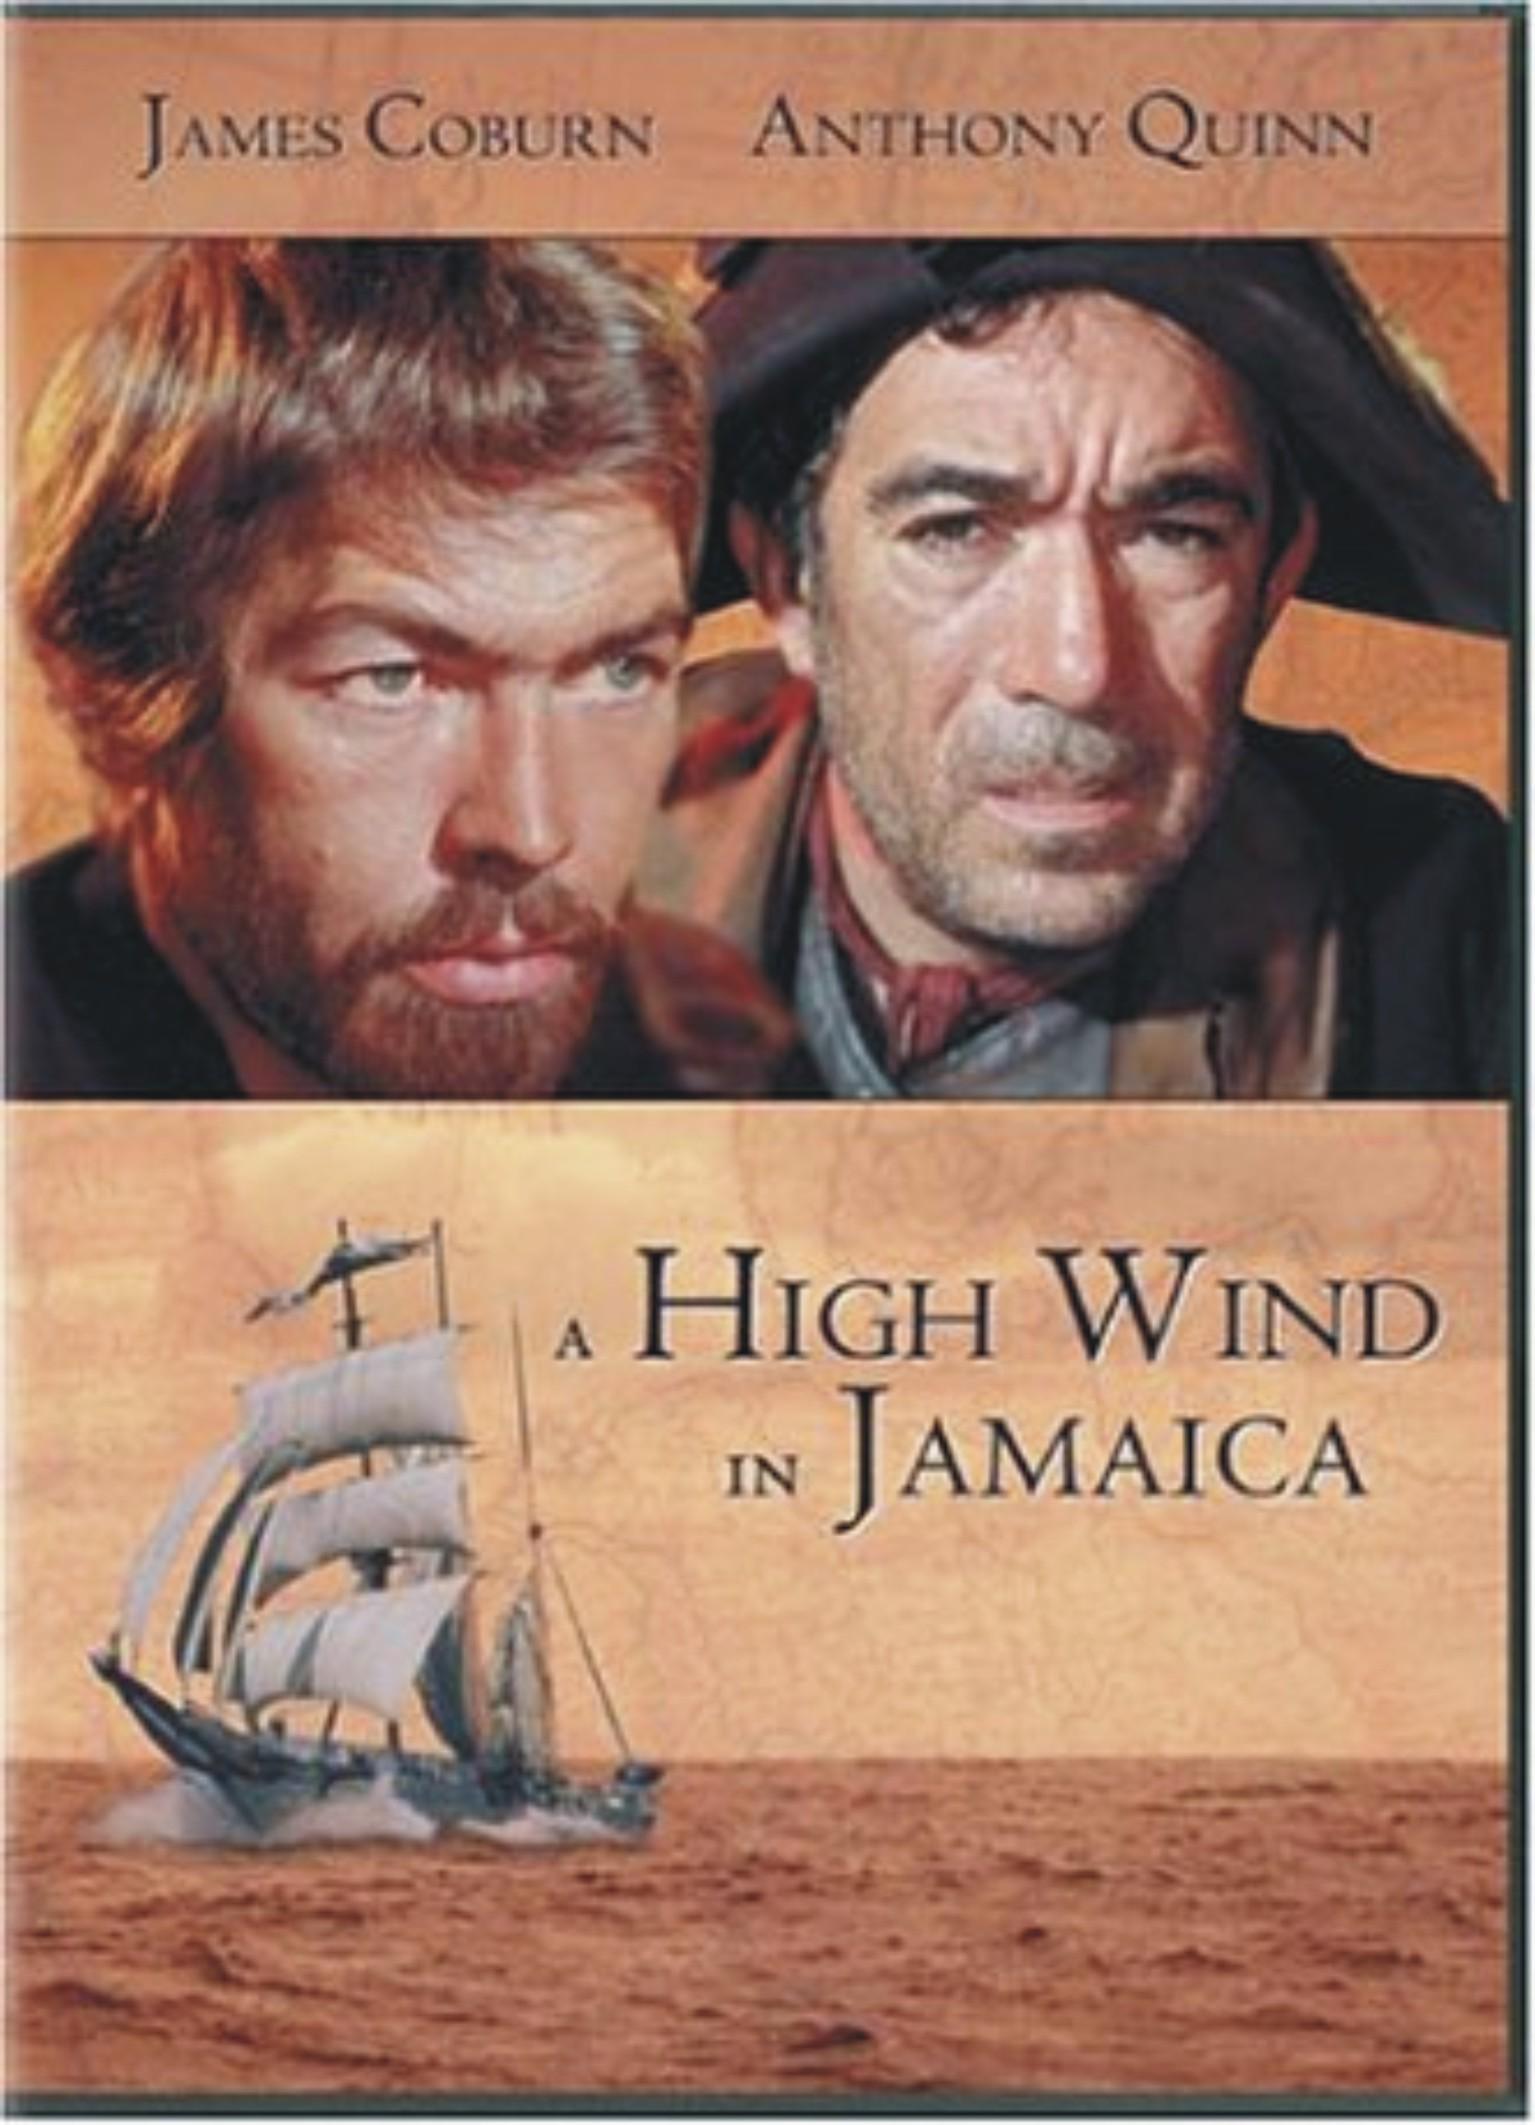 طوفان در جامائیکا (آنتونی کویین و جیمز کابرن)